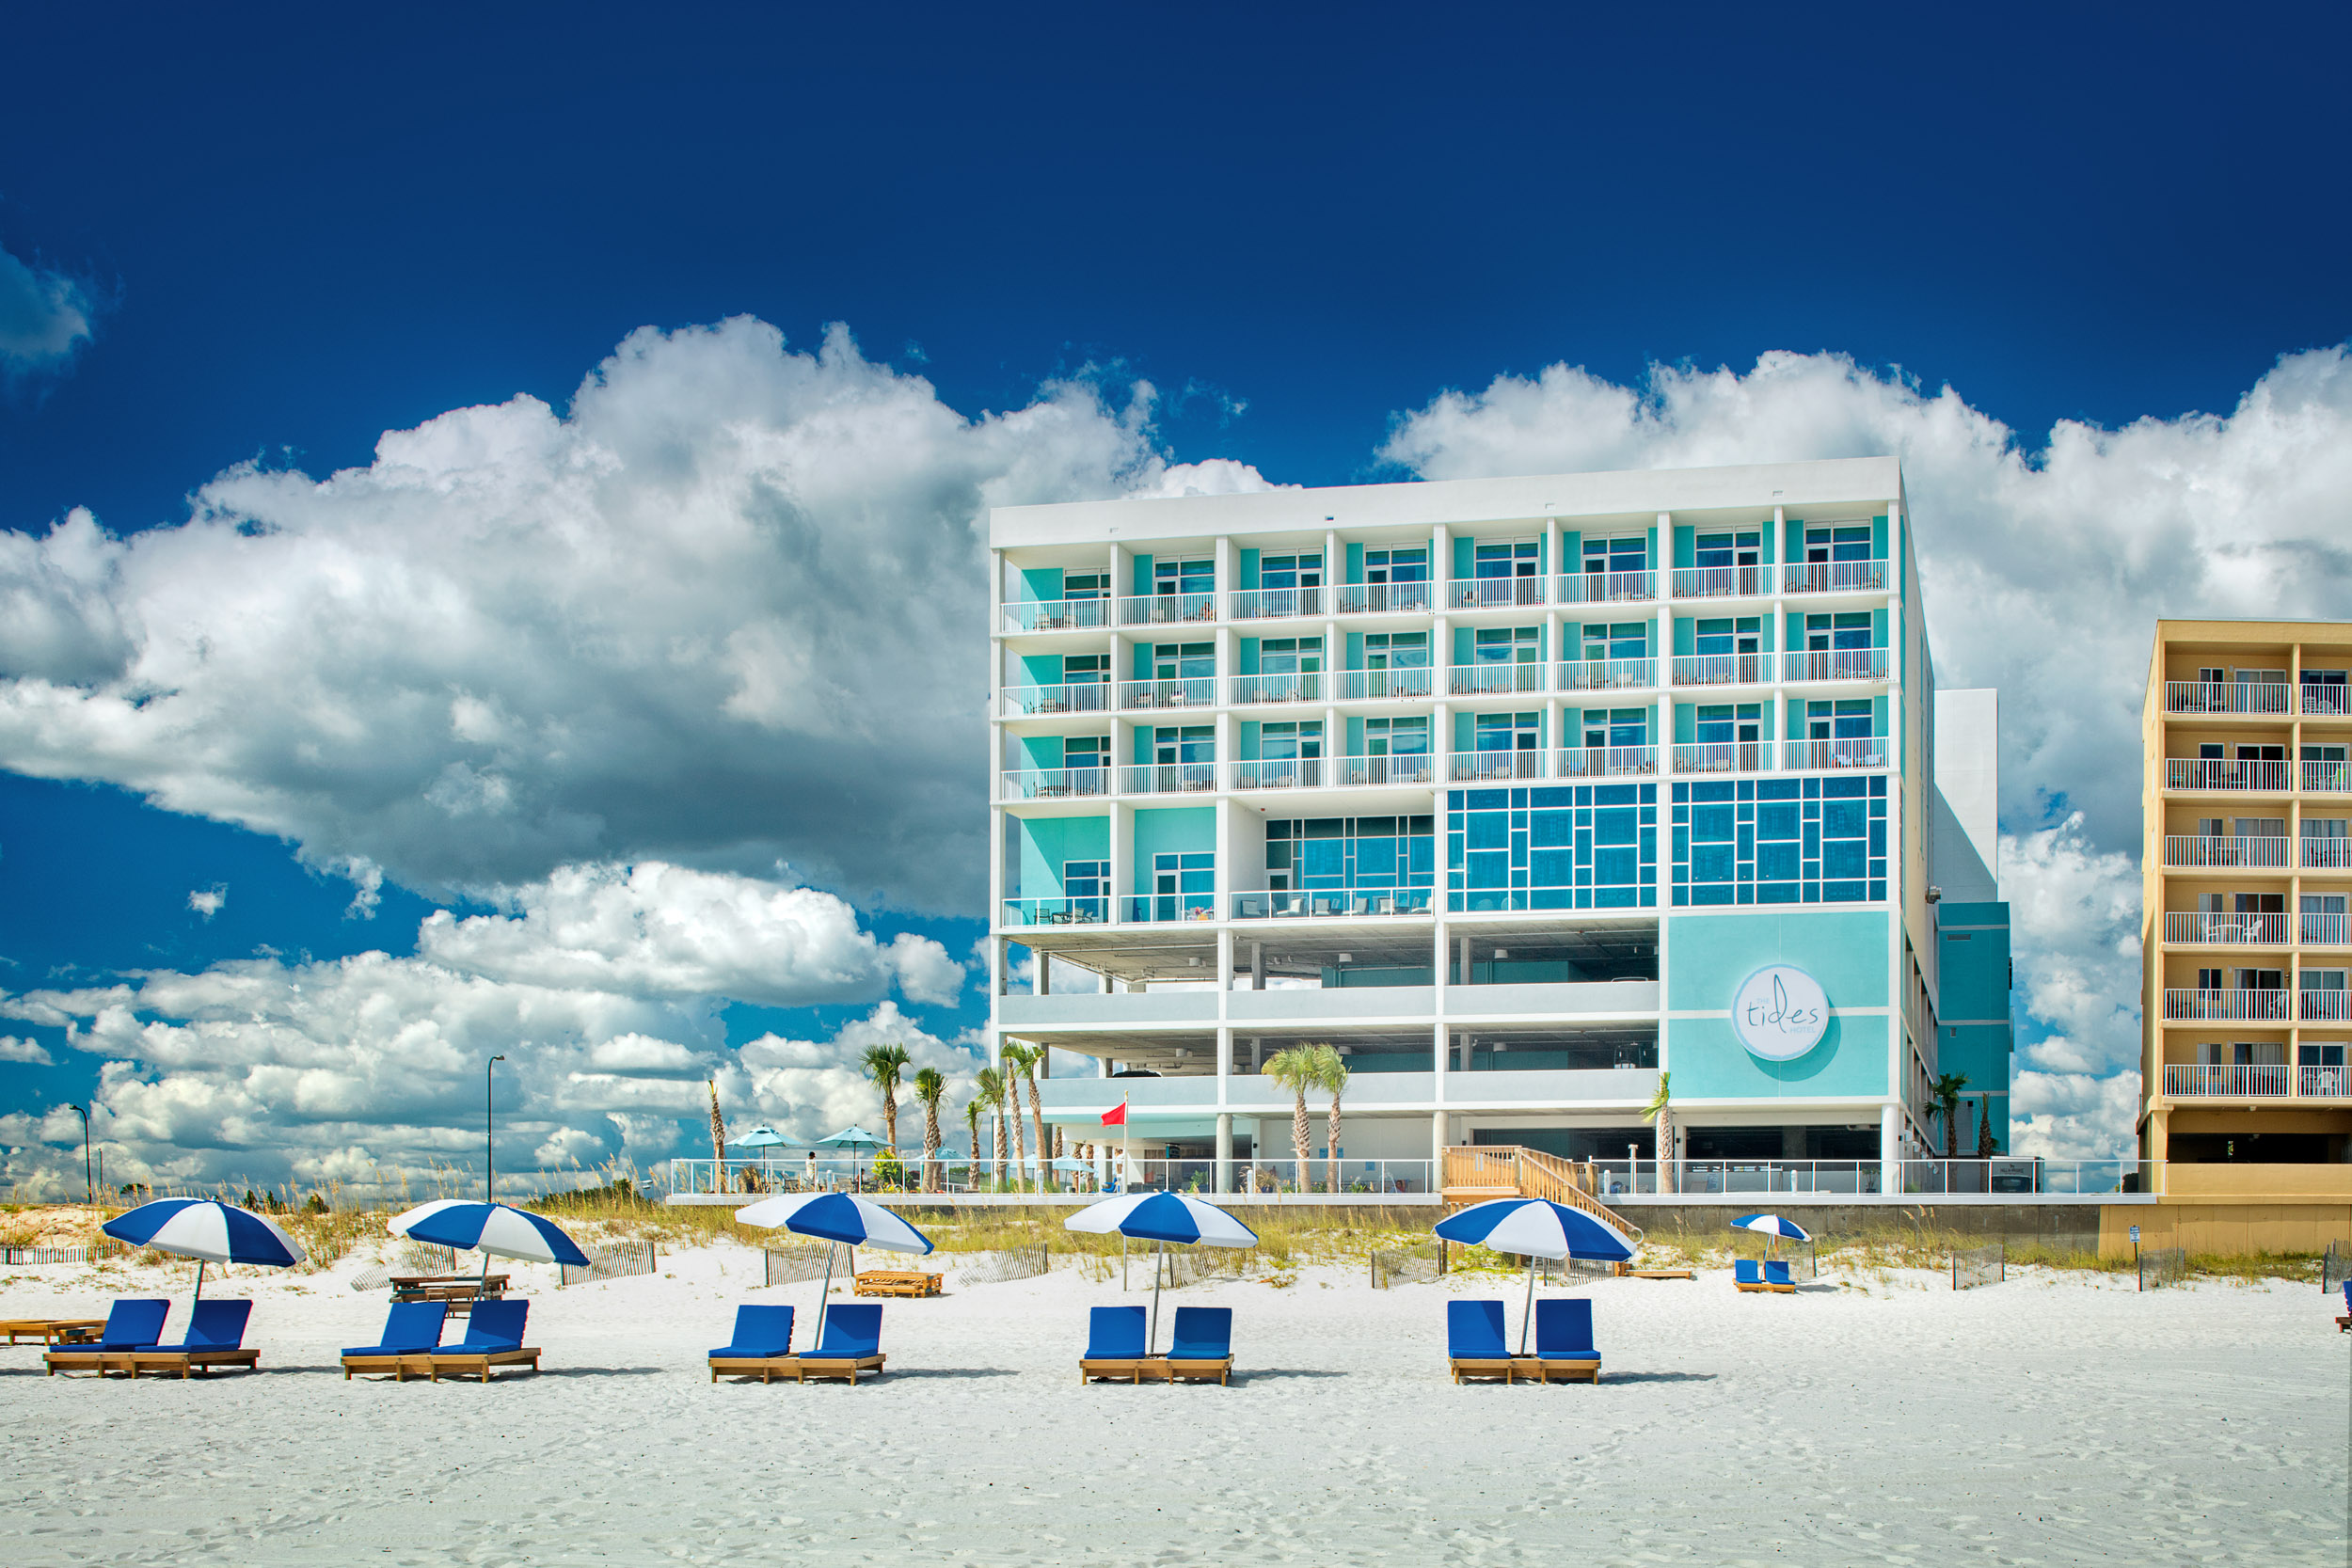 bestwestern_hotel_beachfront_tides-19.jpg